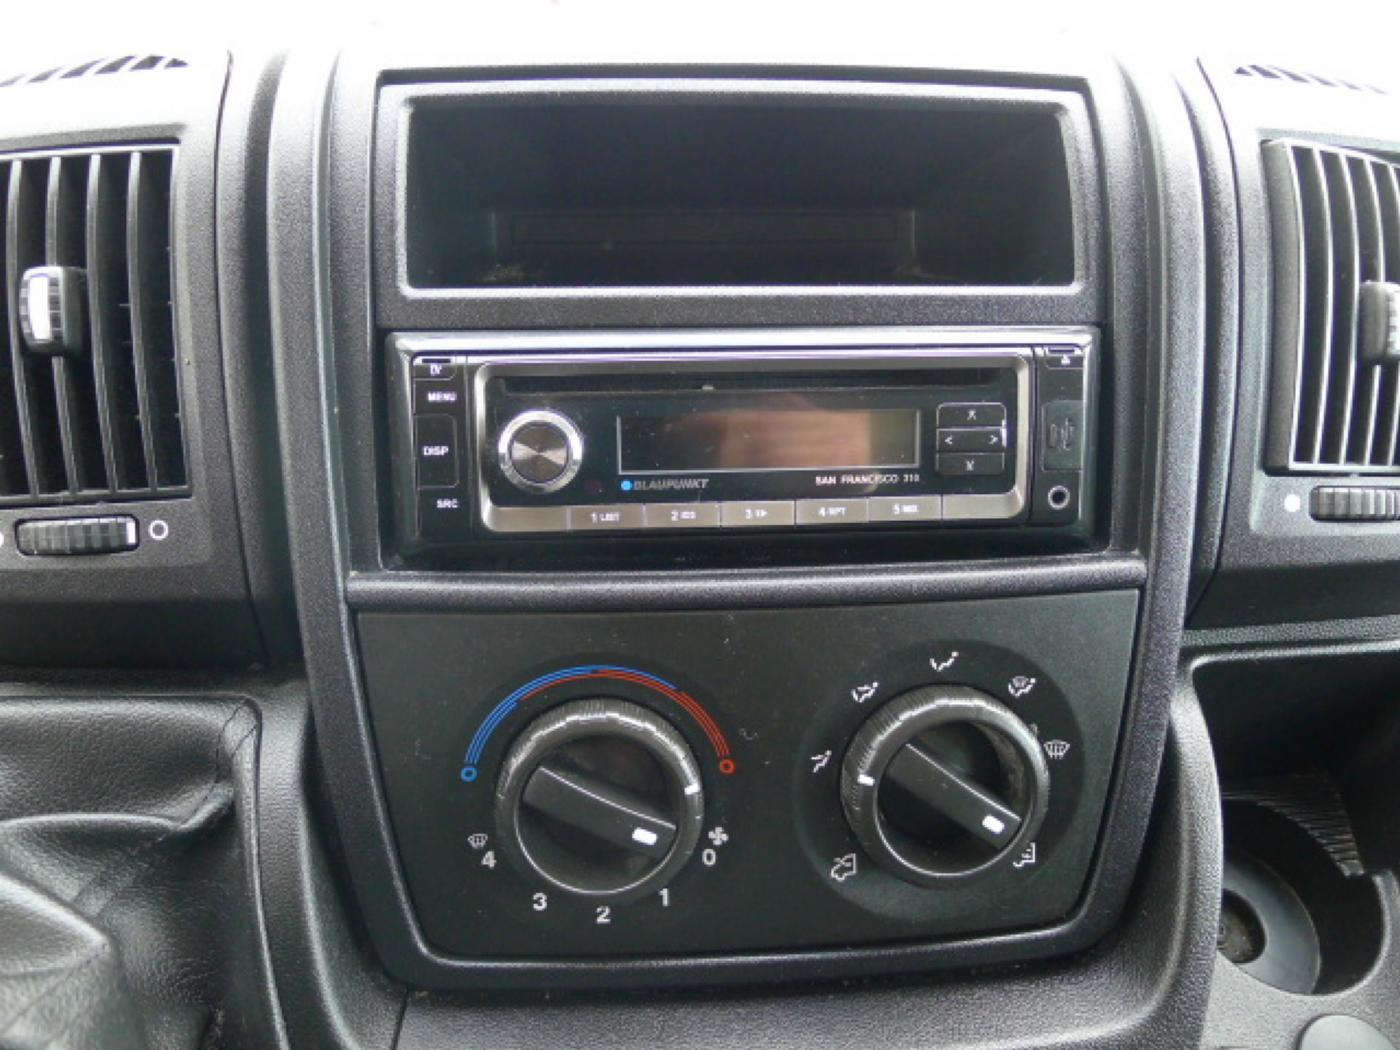 Peugeot Boxer 2.2 HDI L1H1 Klima Akce!!! Novinka - 10